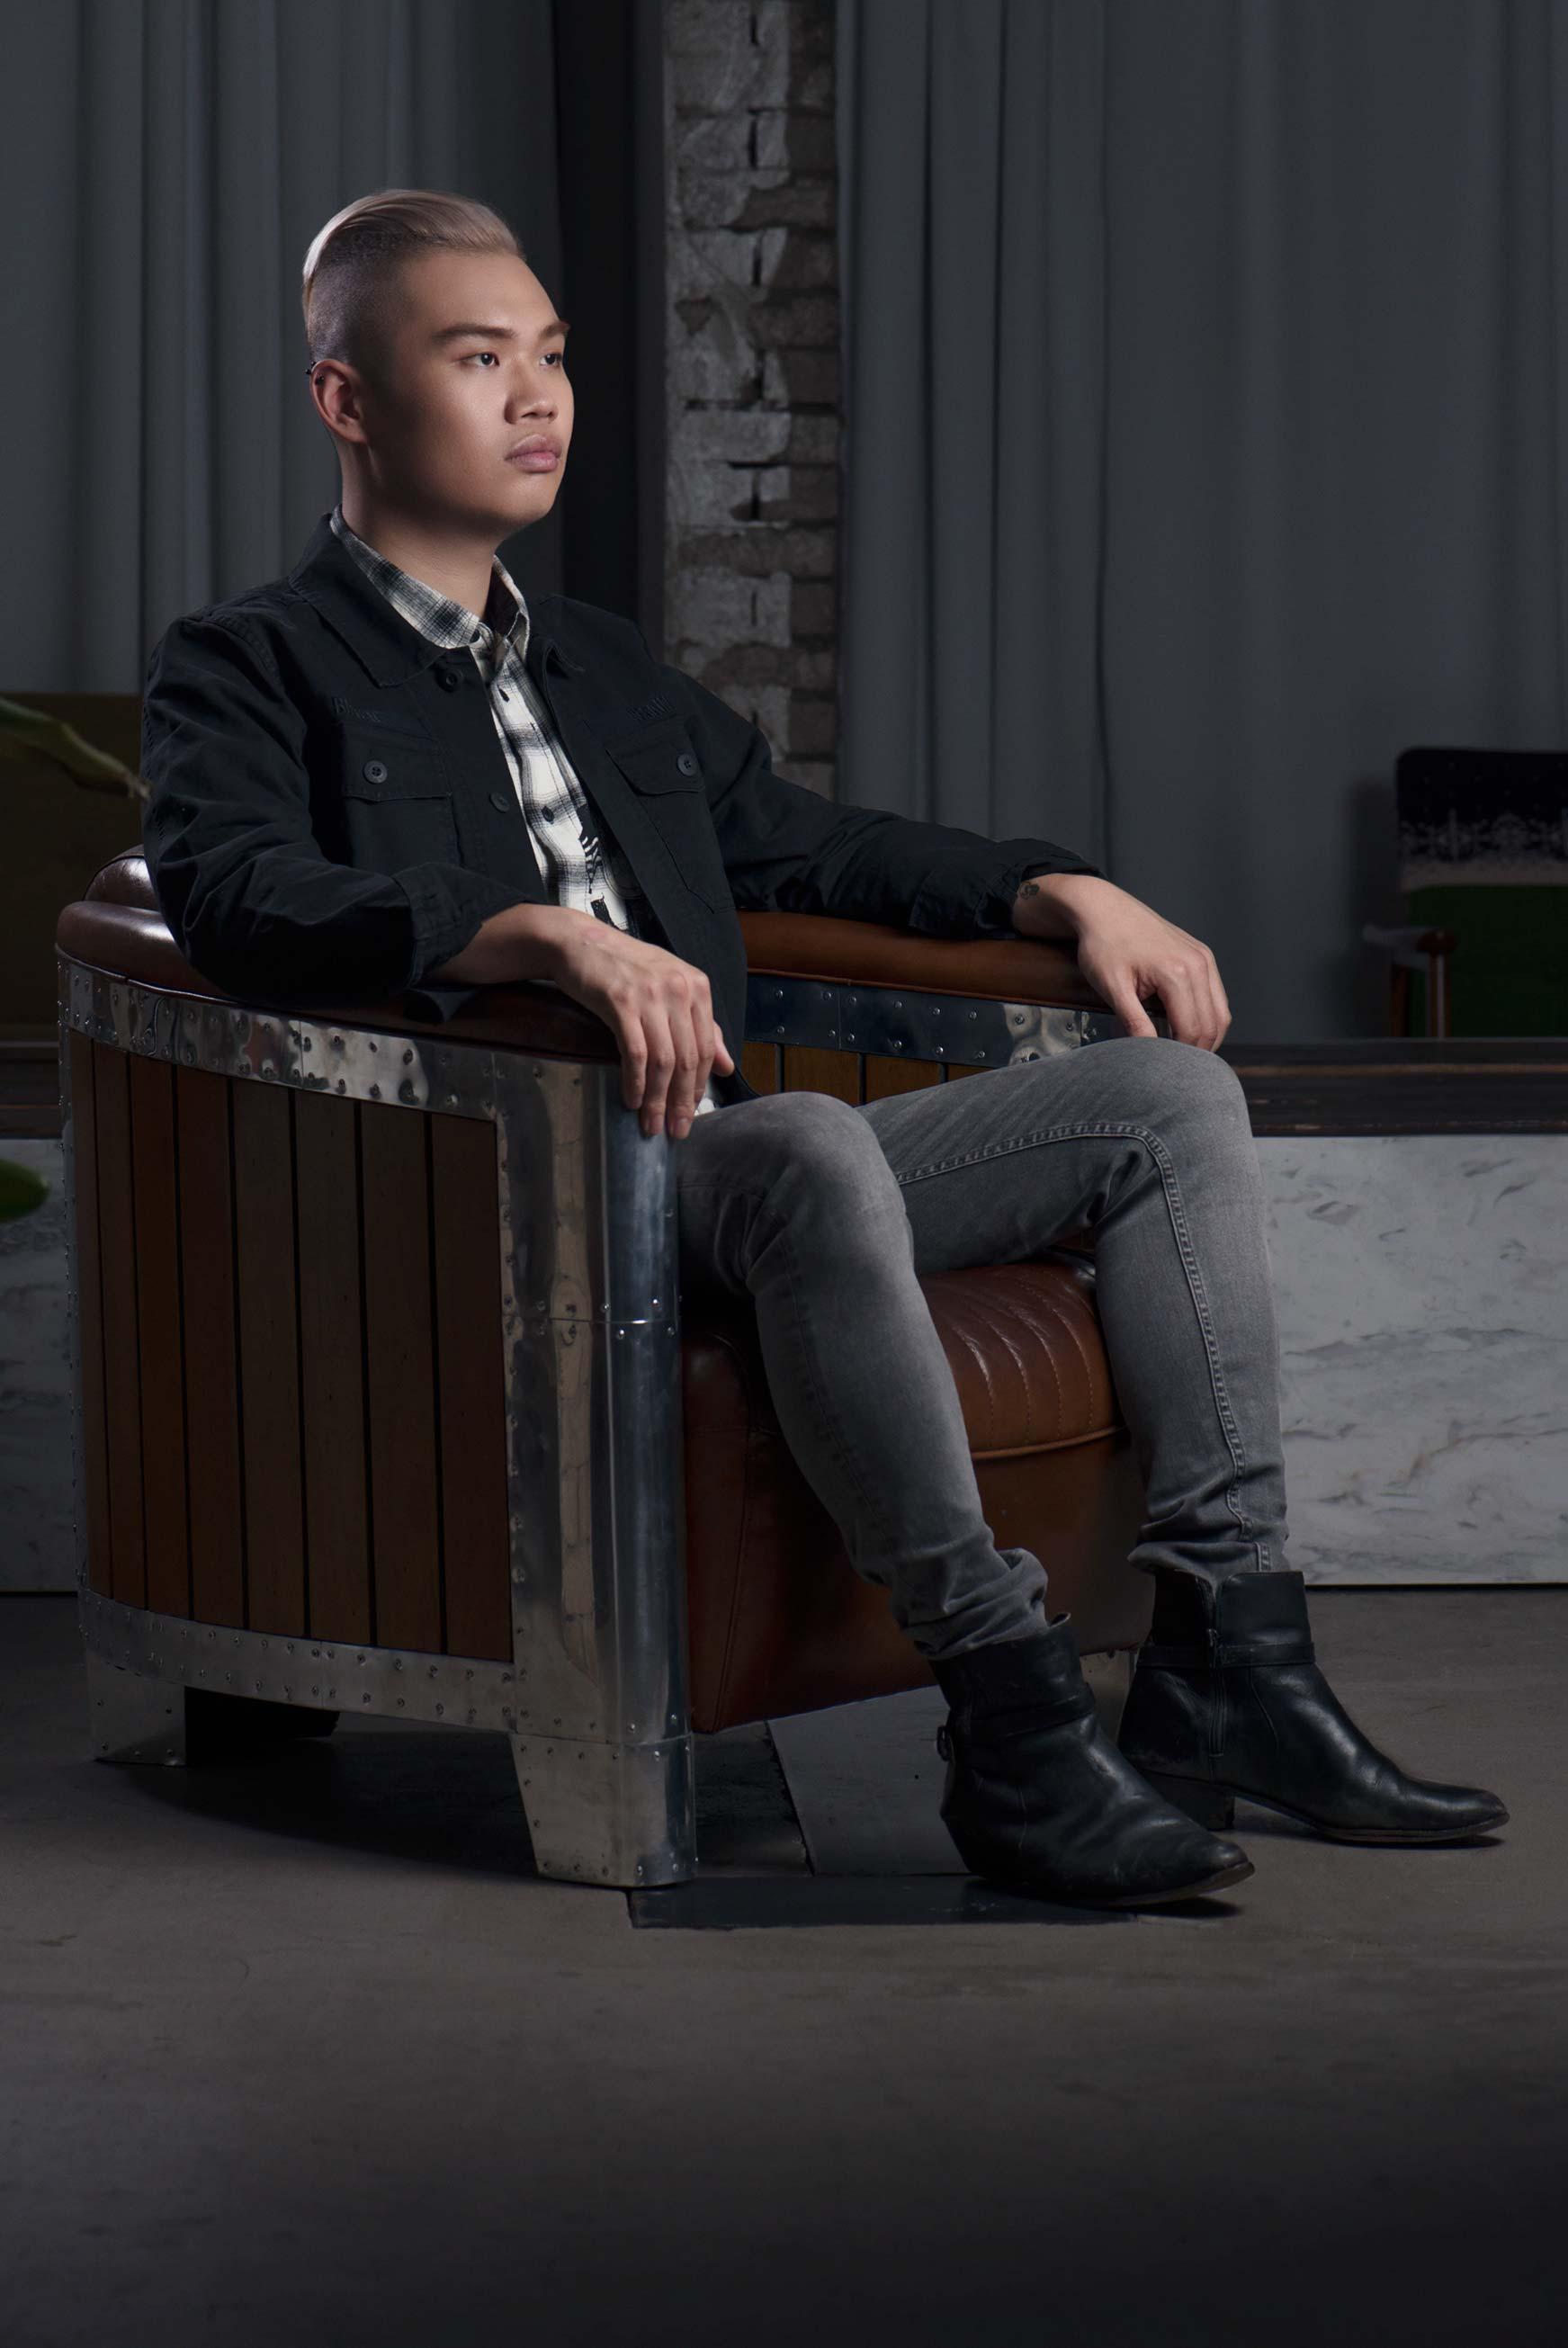 commercial-photography-korea-seoul-marshall-bang-3-jorge-gonzalez